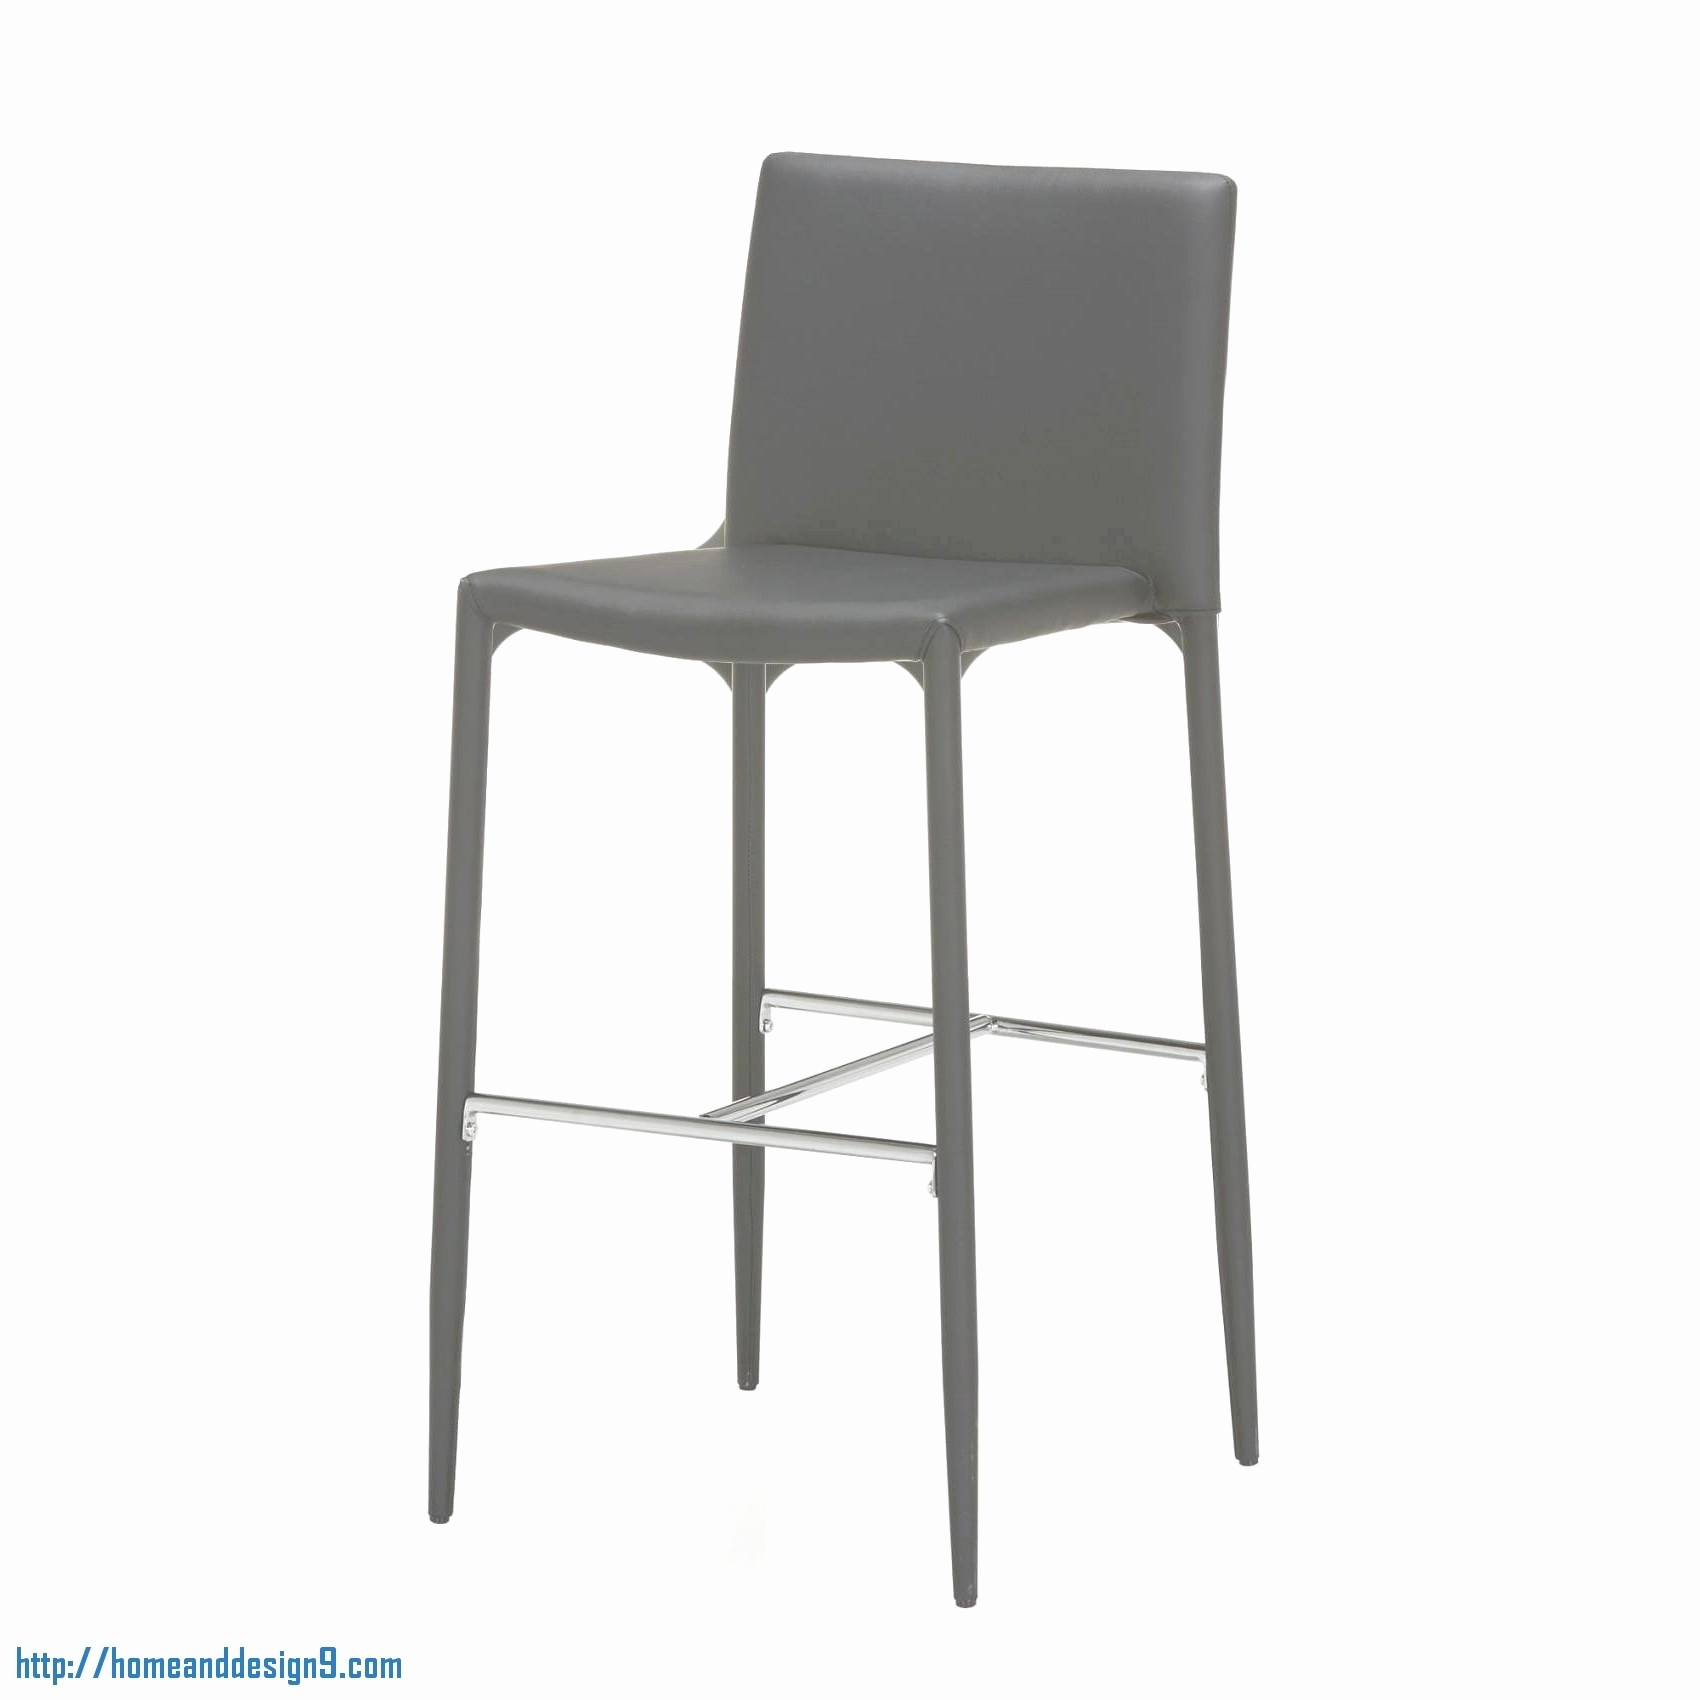 chaise de jardin en metal inspire table de jardin metal pliante of chaise de jardin en metal